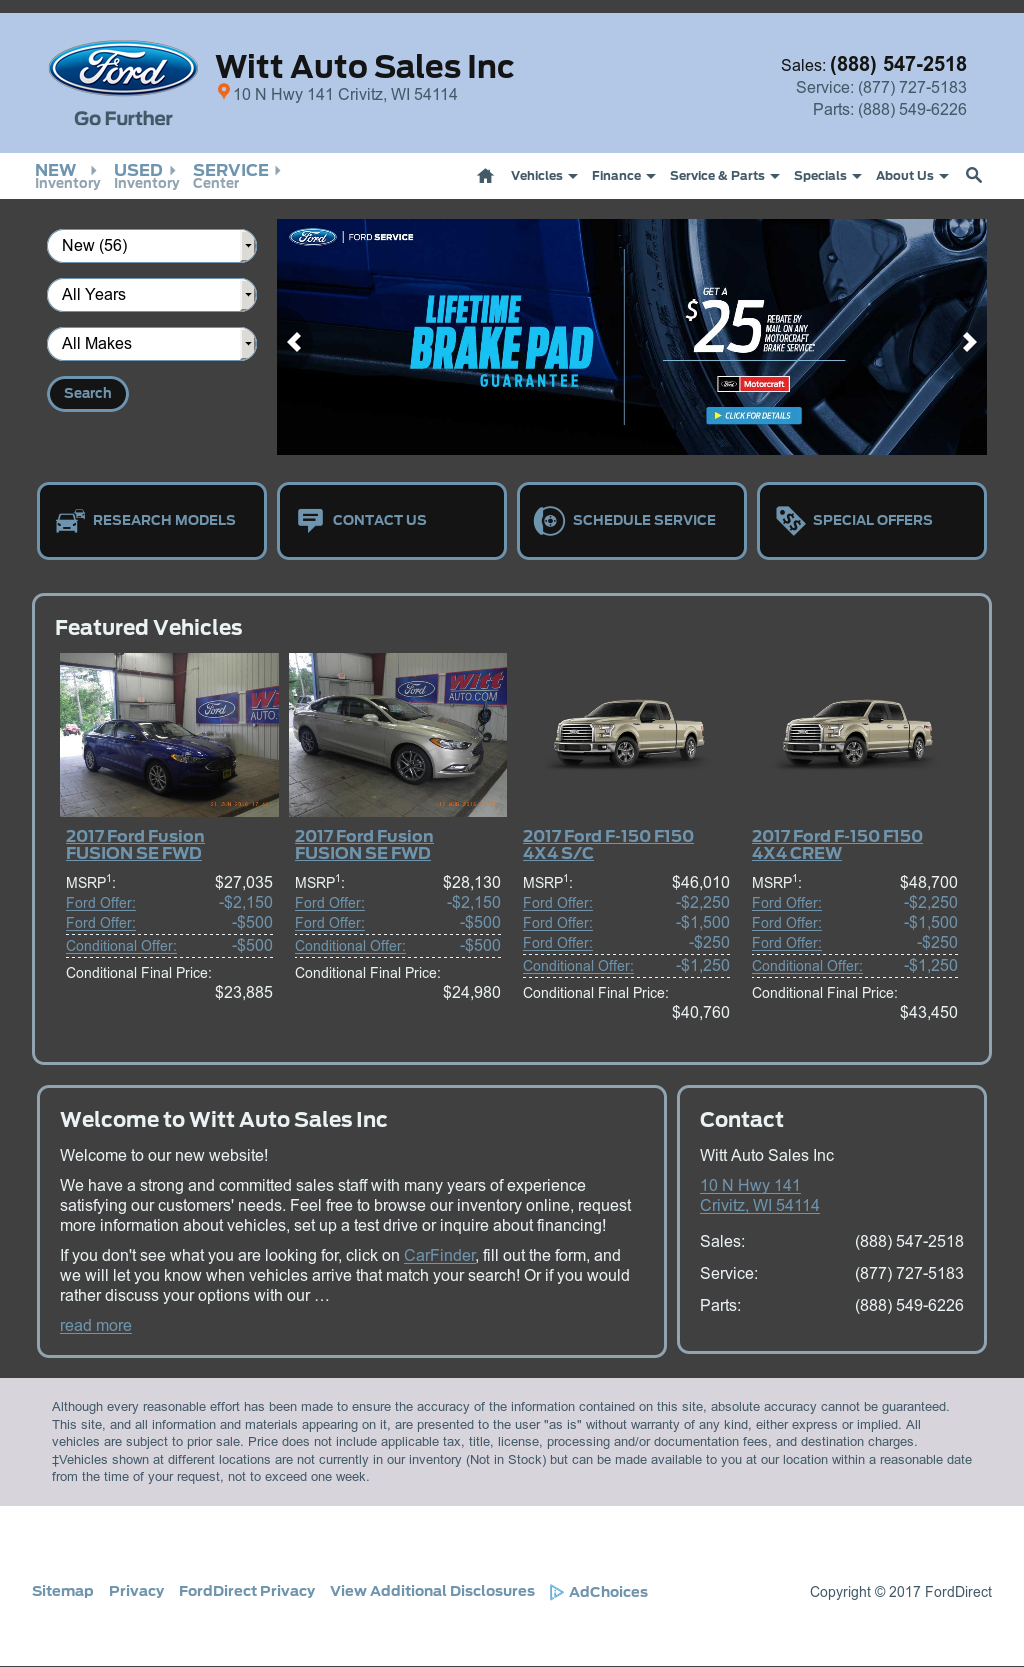 witt auto sales website history